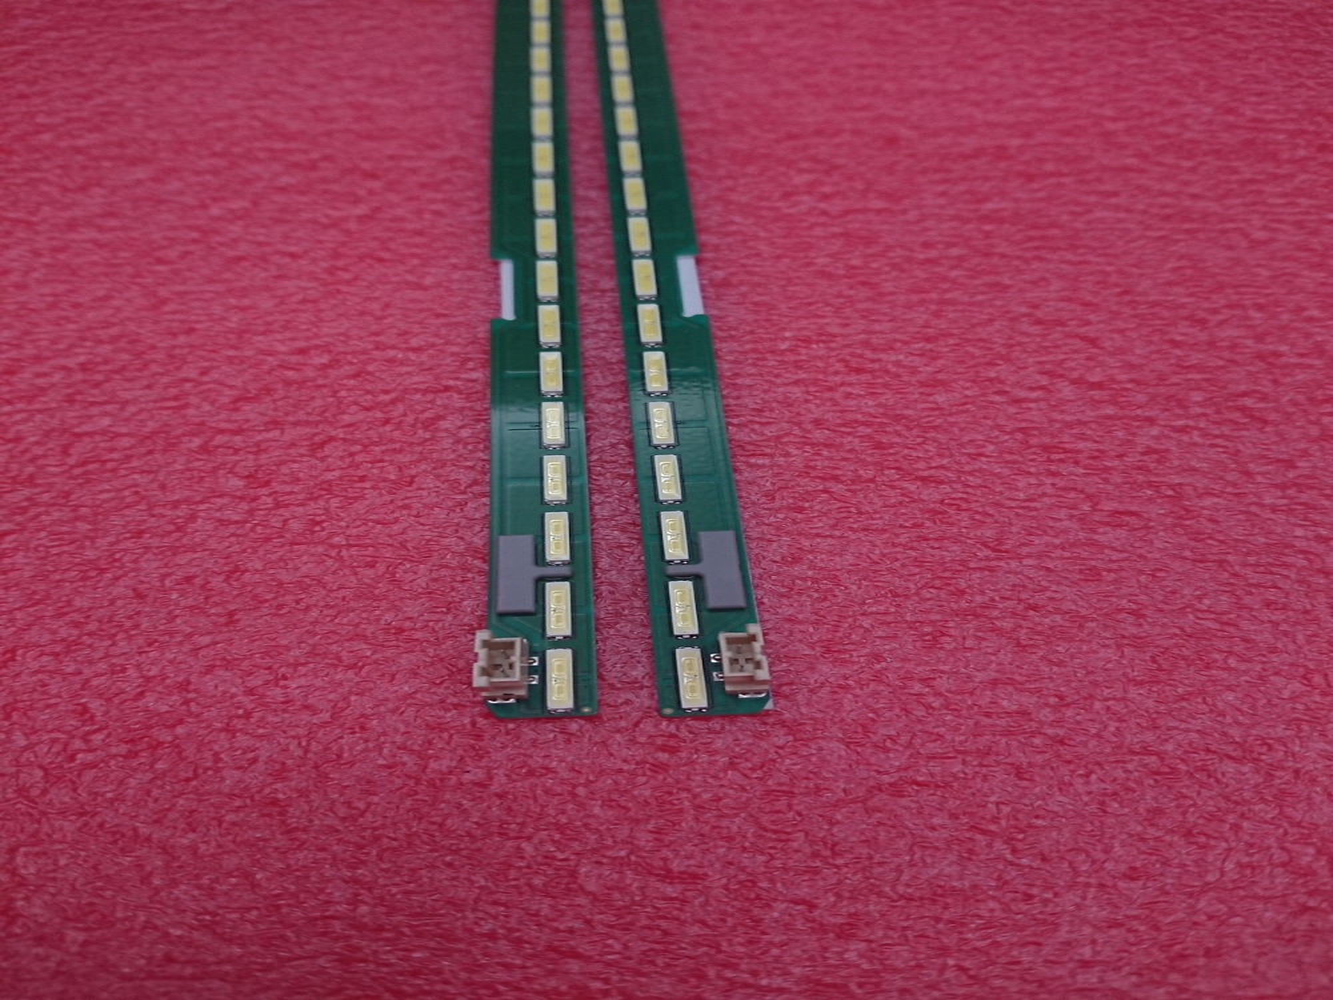 New Kit 2 PCS 60LED 602mm LED backlight strip for LG 55UF6450 55UH6150 55UF6430 6916L2318A 6916L2319A